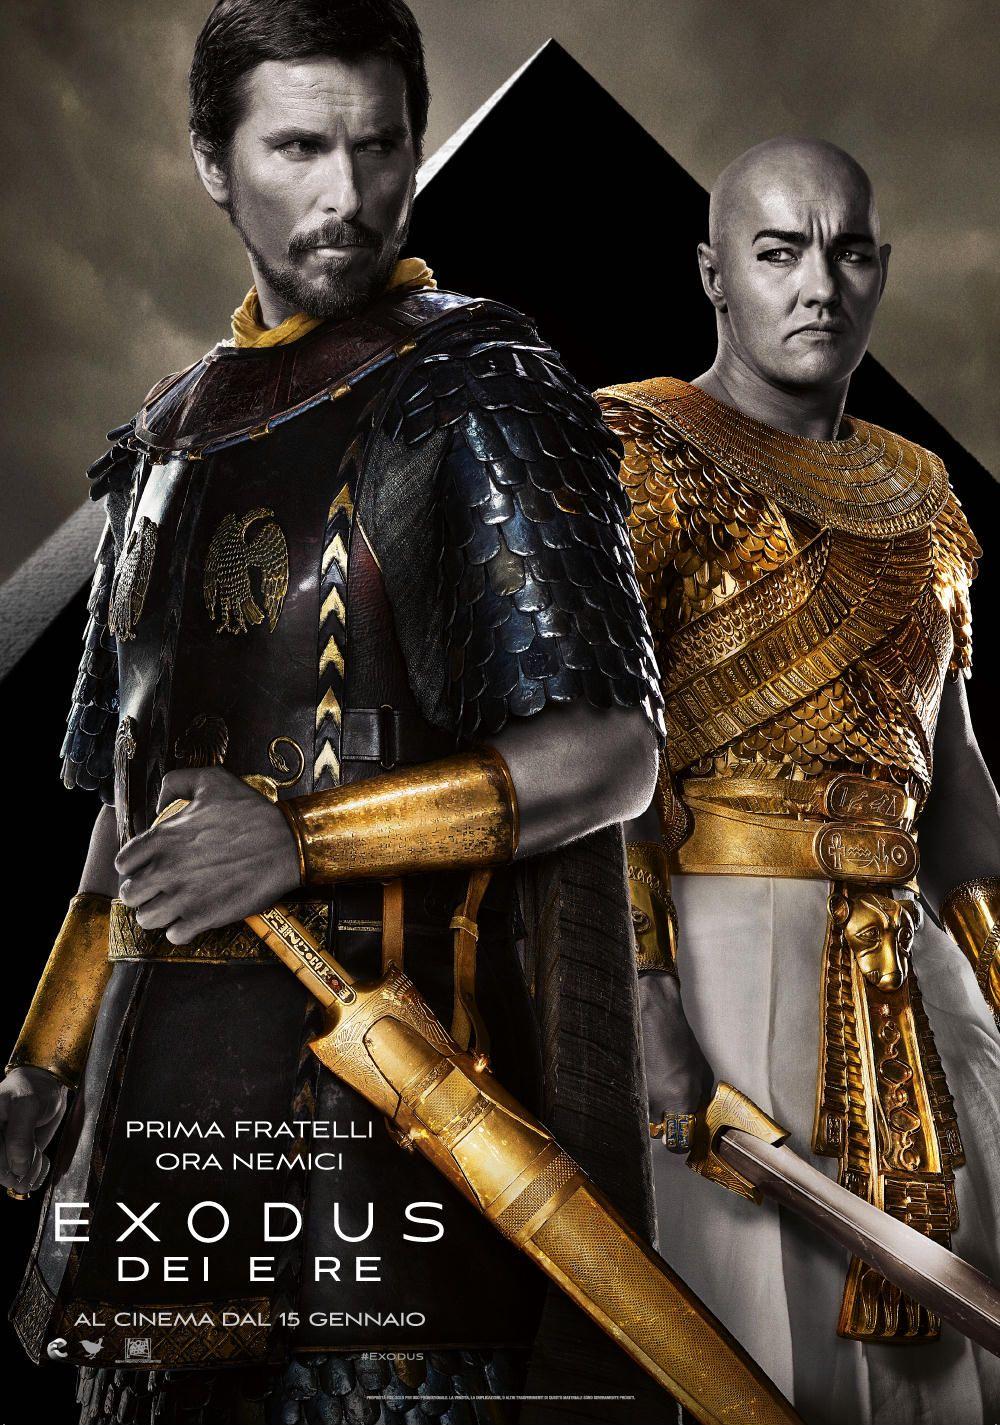 Exodus Dei E Re 2014 Christian Bale Nuovi Film Film